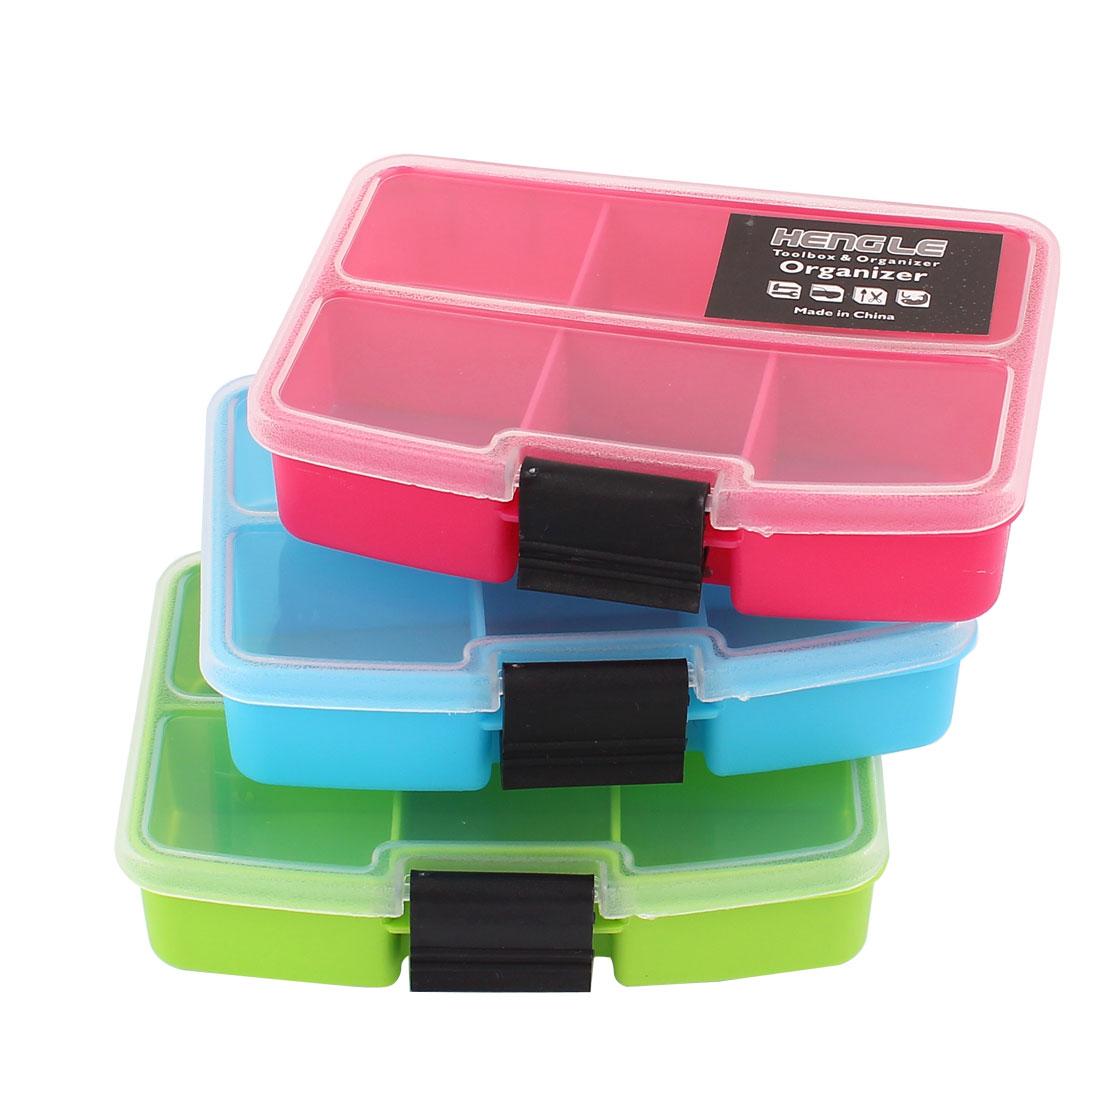 Tri Color Fishing Tool Container Organizer Storage Box Case 6 Compartments 3pcs